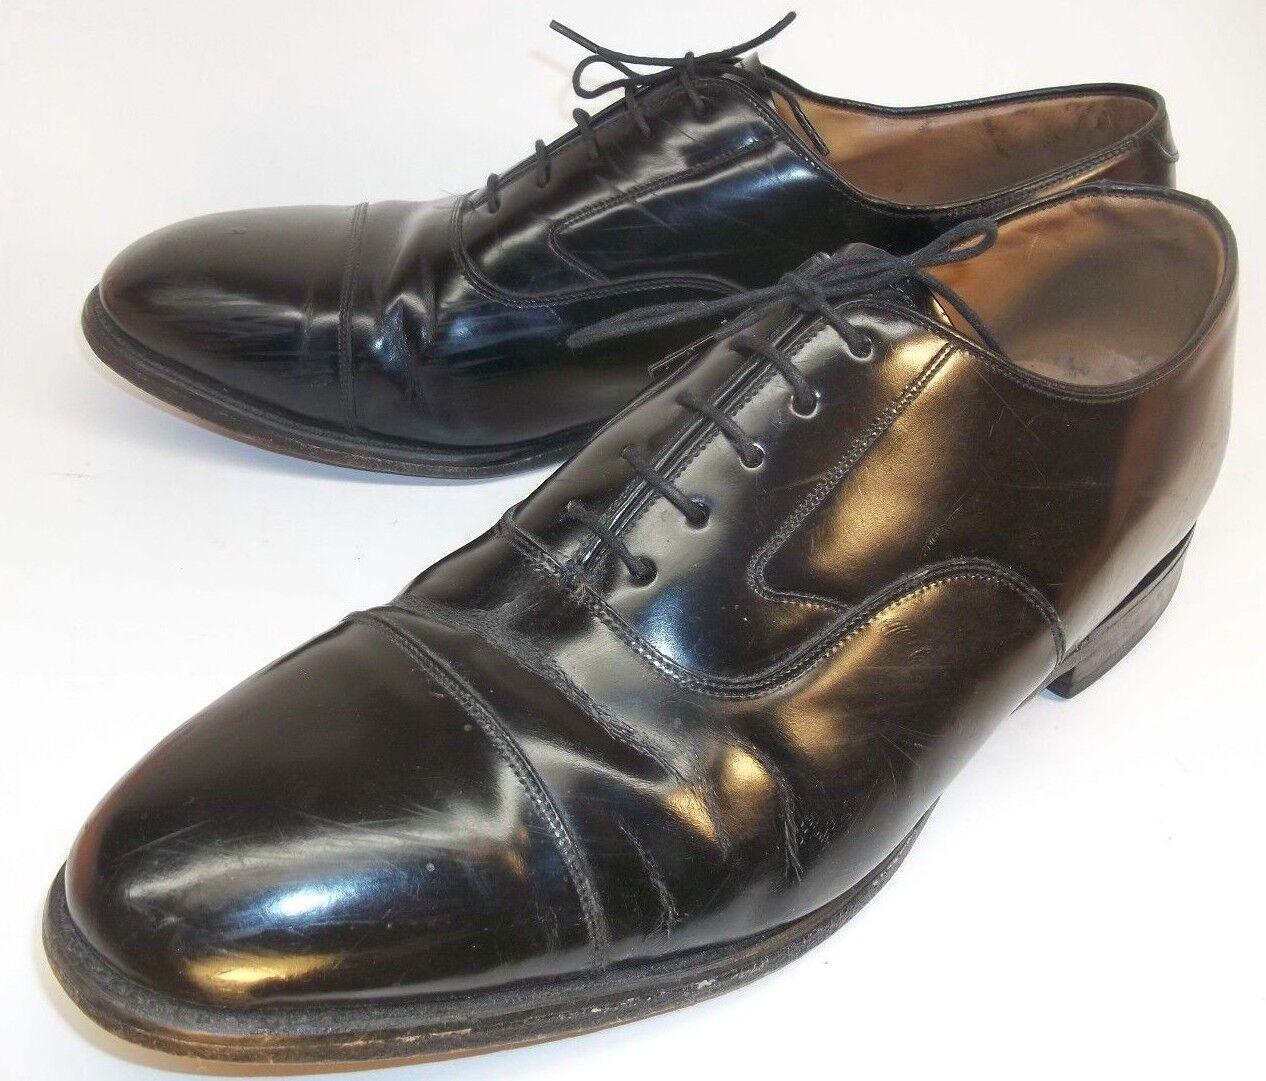 Johnston Murphy Mens shoes Oxford US 12 D Black Leather Lace Cap Toe Mexico 5605